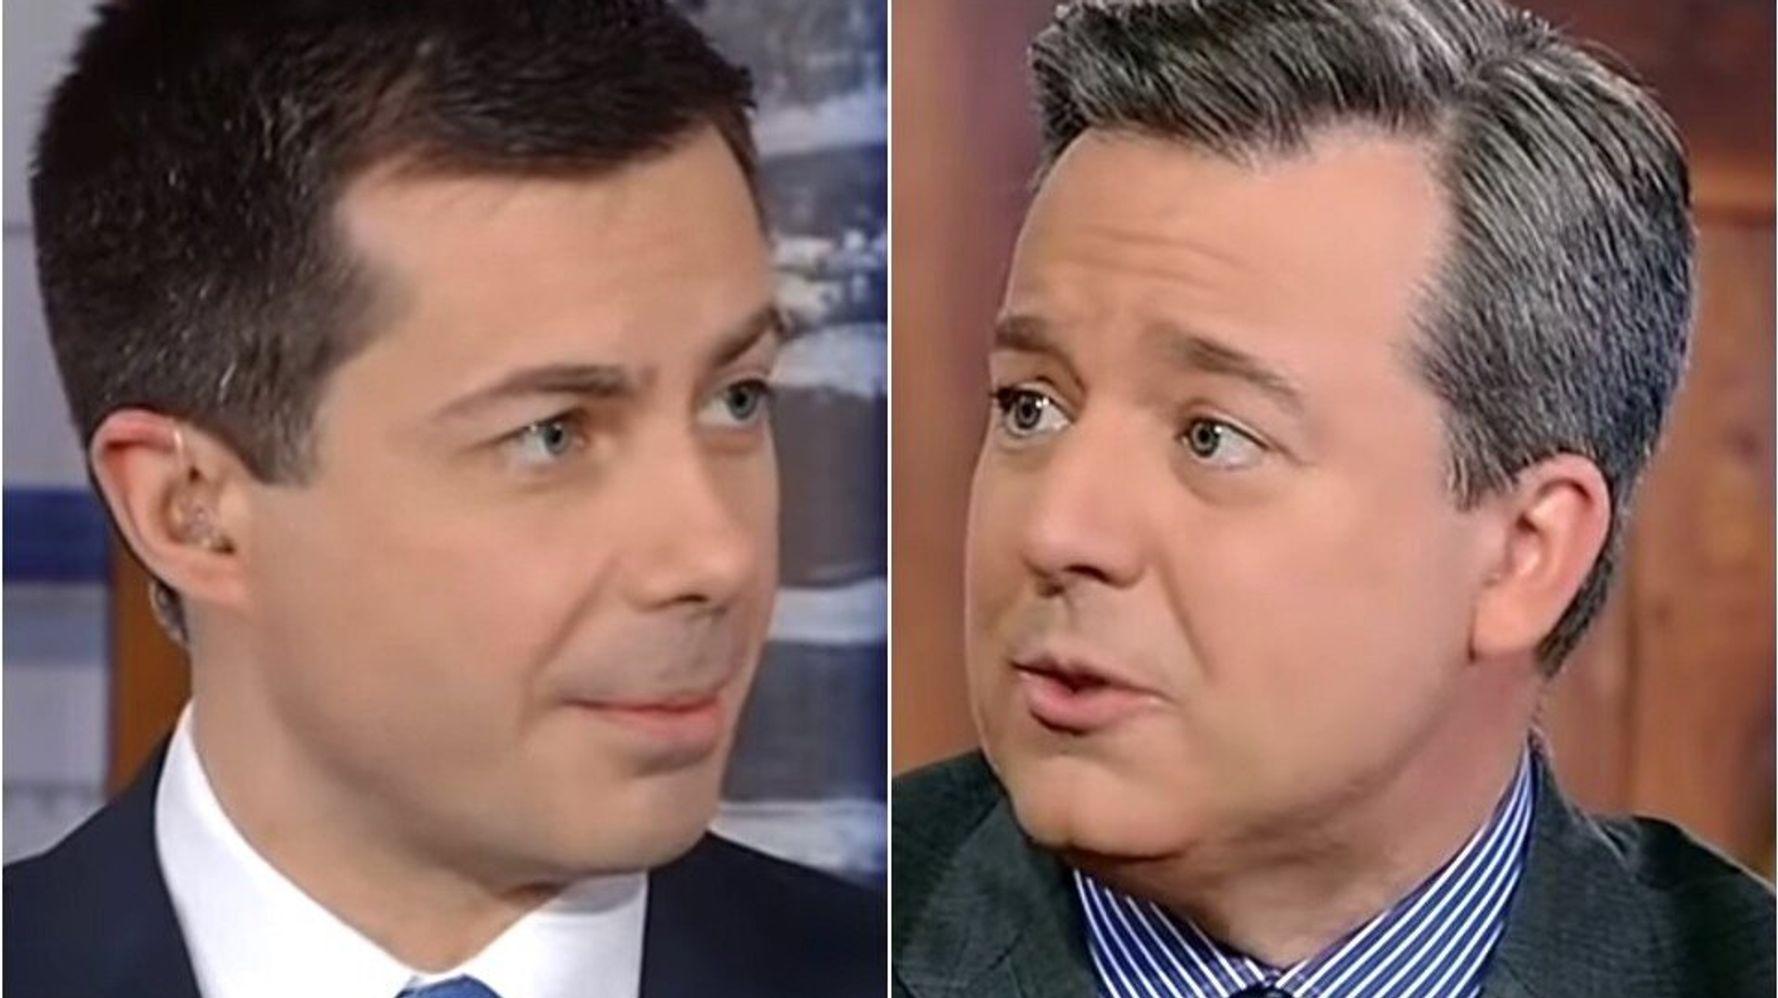 Fox News Host Tried To Corner Pete Buttigieg. It Didn't Go Well.